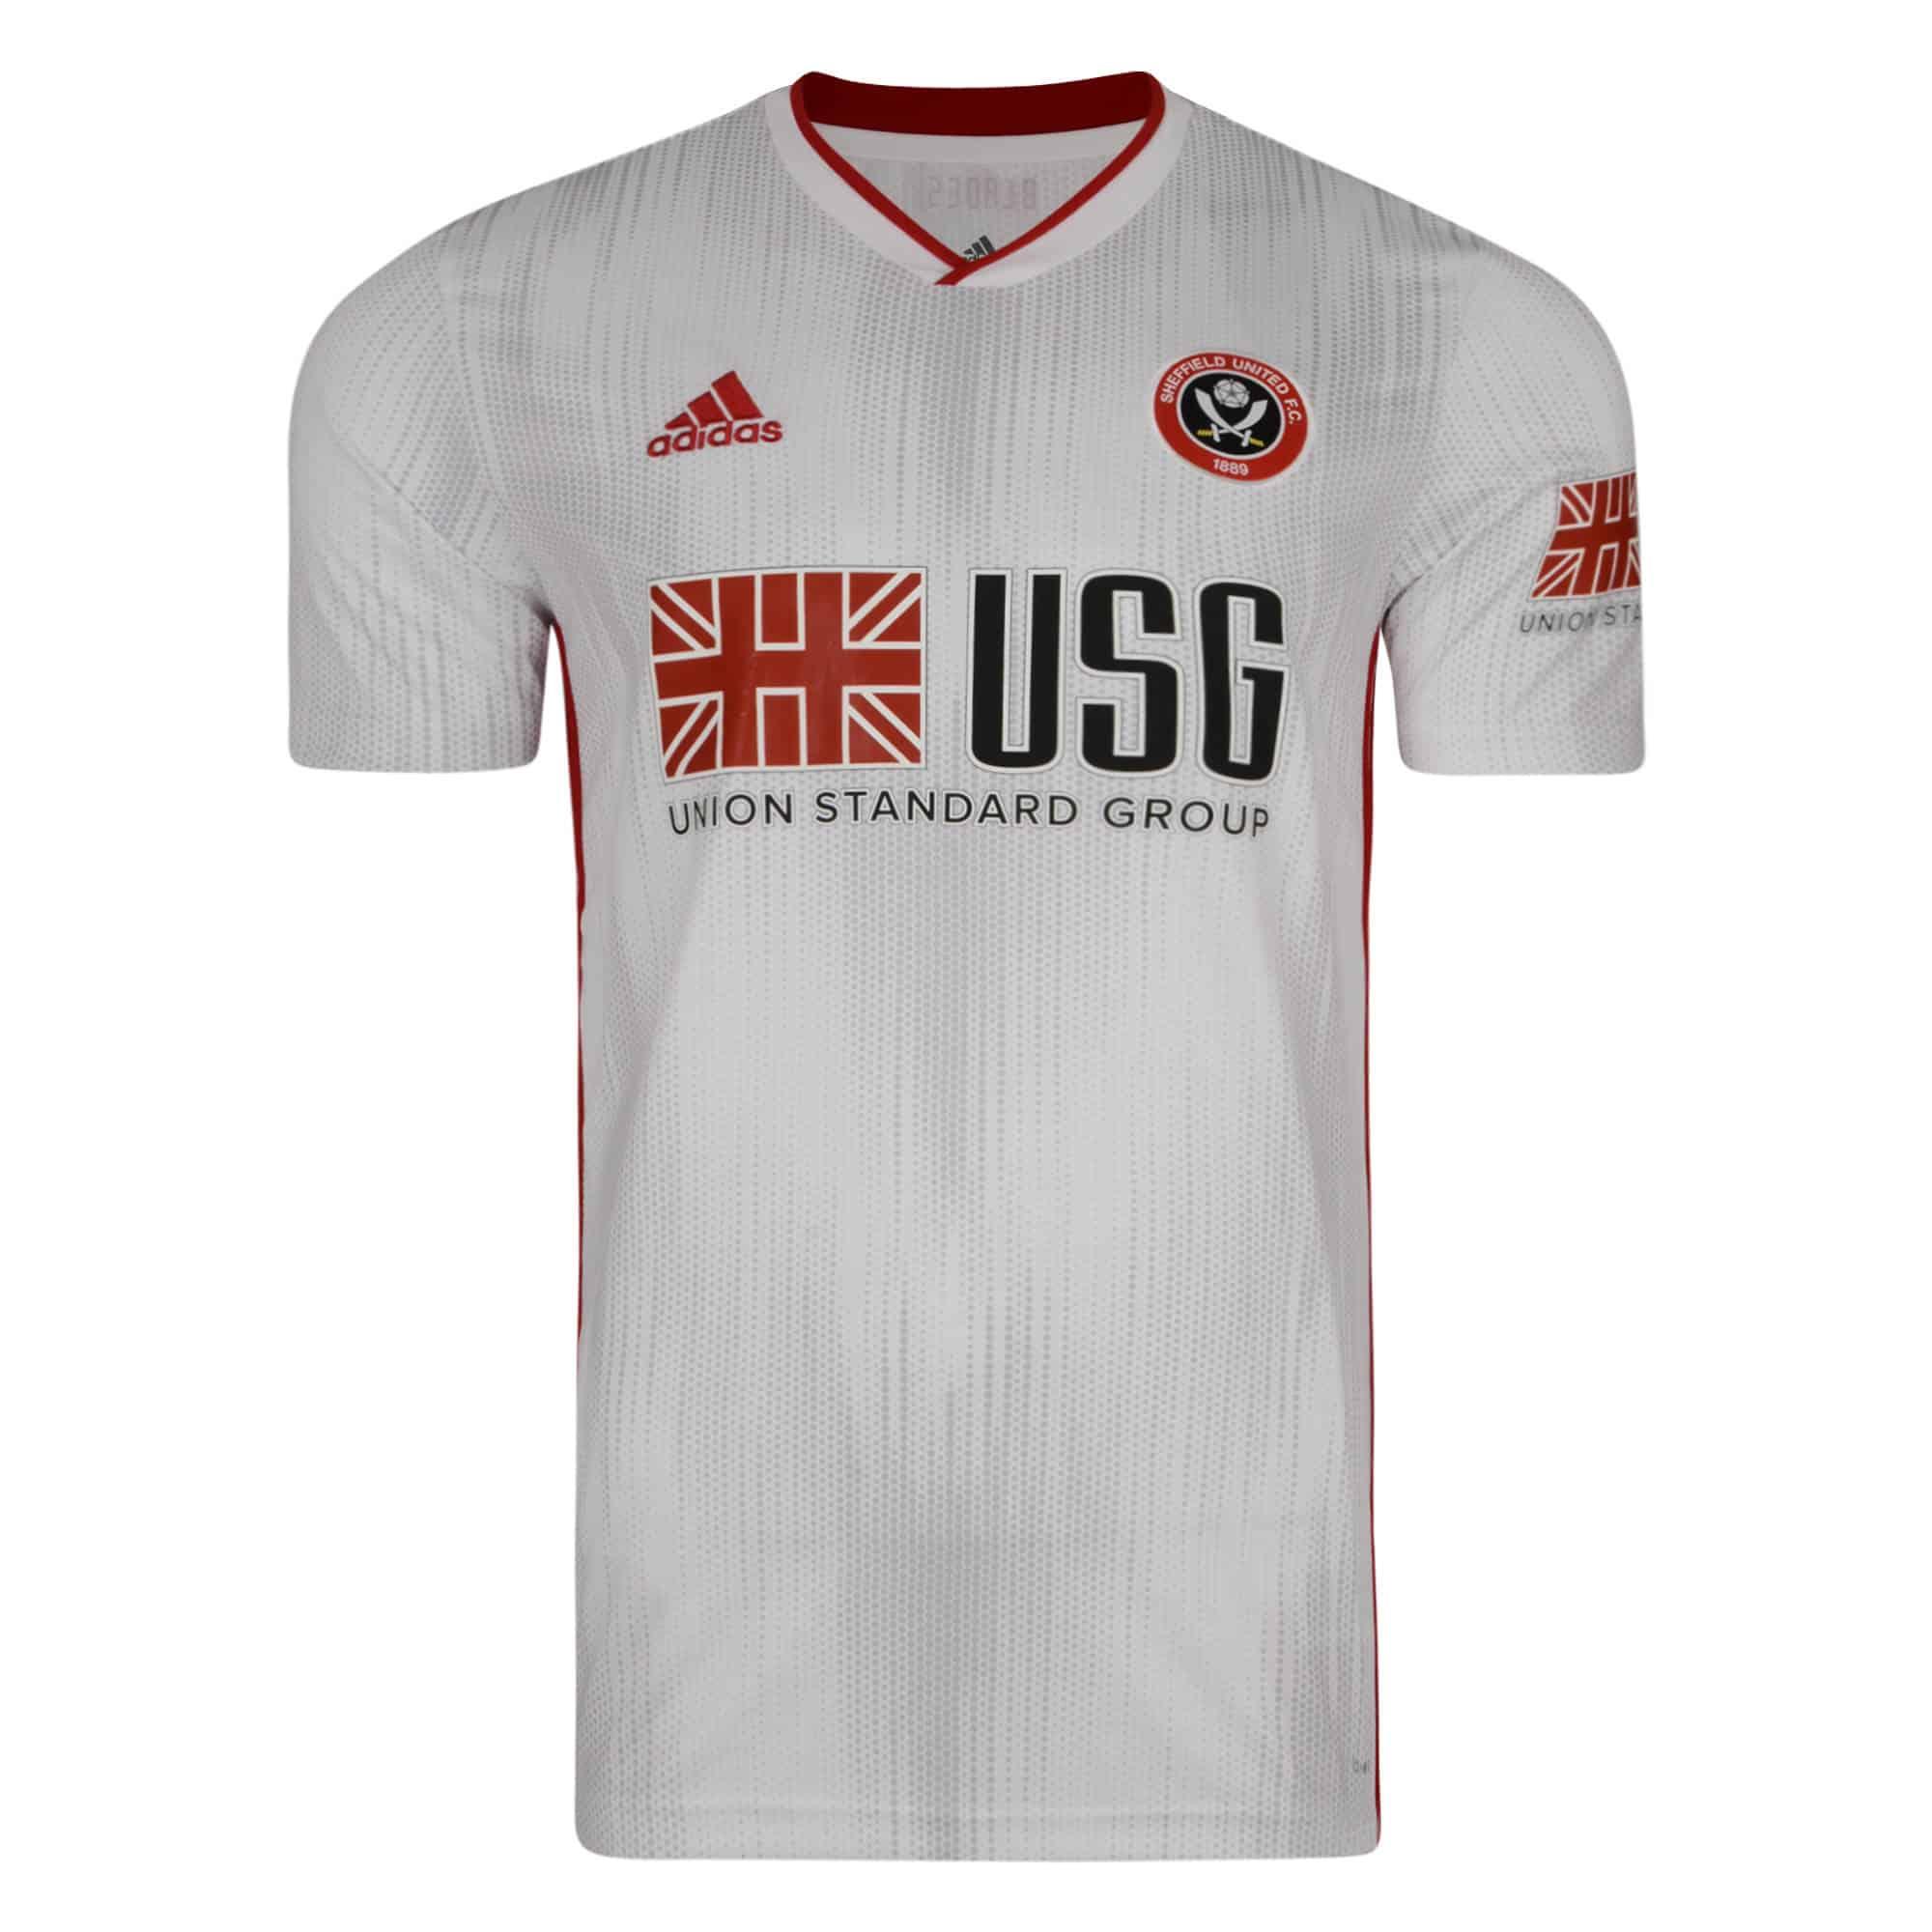 maillot-football-adidas-sheffield-united-exterieur-2019-2020